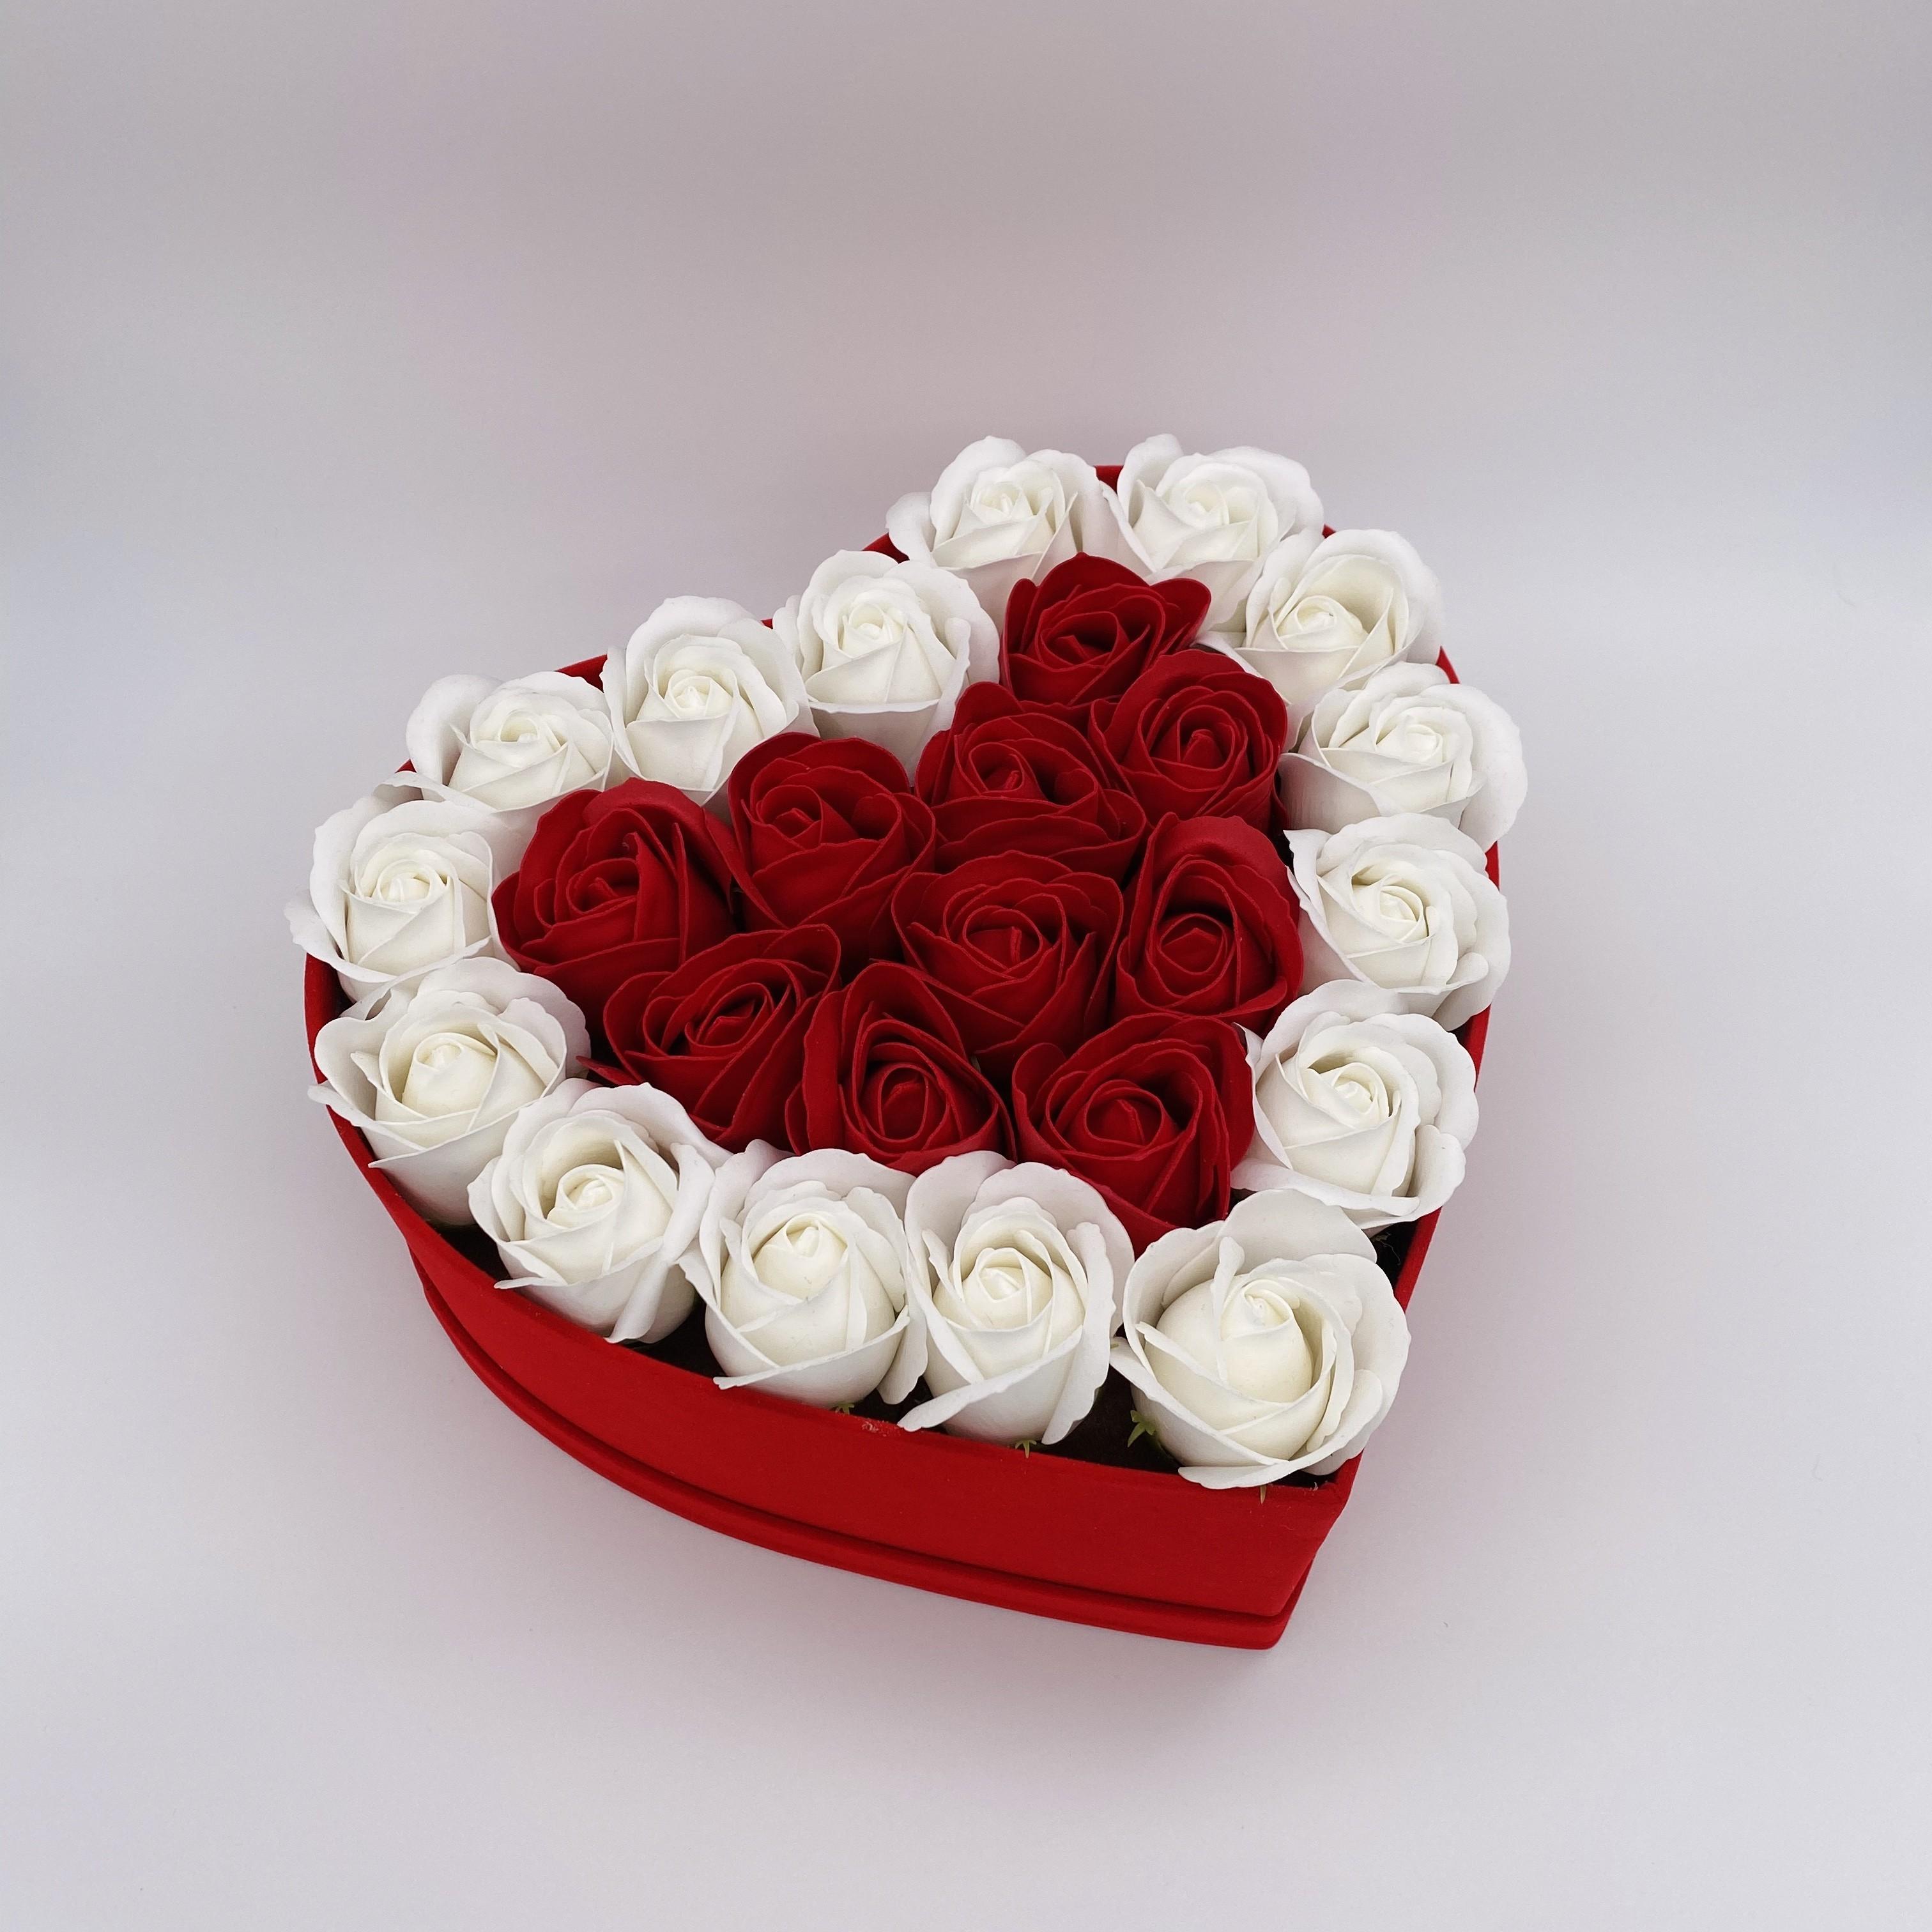 Aranjament Floral in forma de Inima, 25 Trandafiri Rosii/Albi, Cutie Rosie de Catifea, Mediu imagine techstar.ro 2021